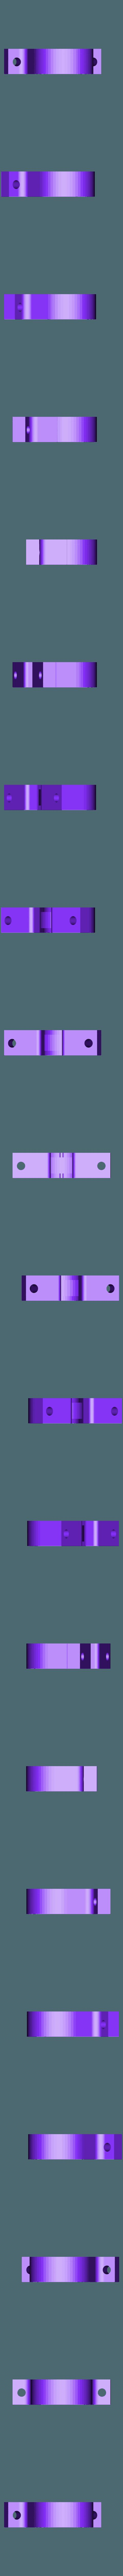 soporte rodamiento 24mm exterior.stl Download STL file Bearing bracket 609 • 3D printer template, salti_ca